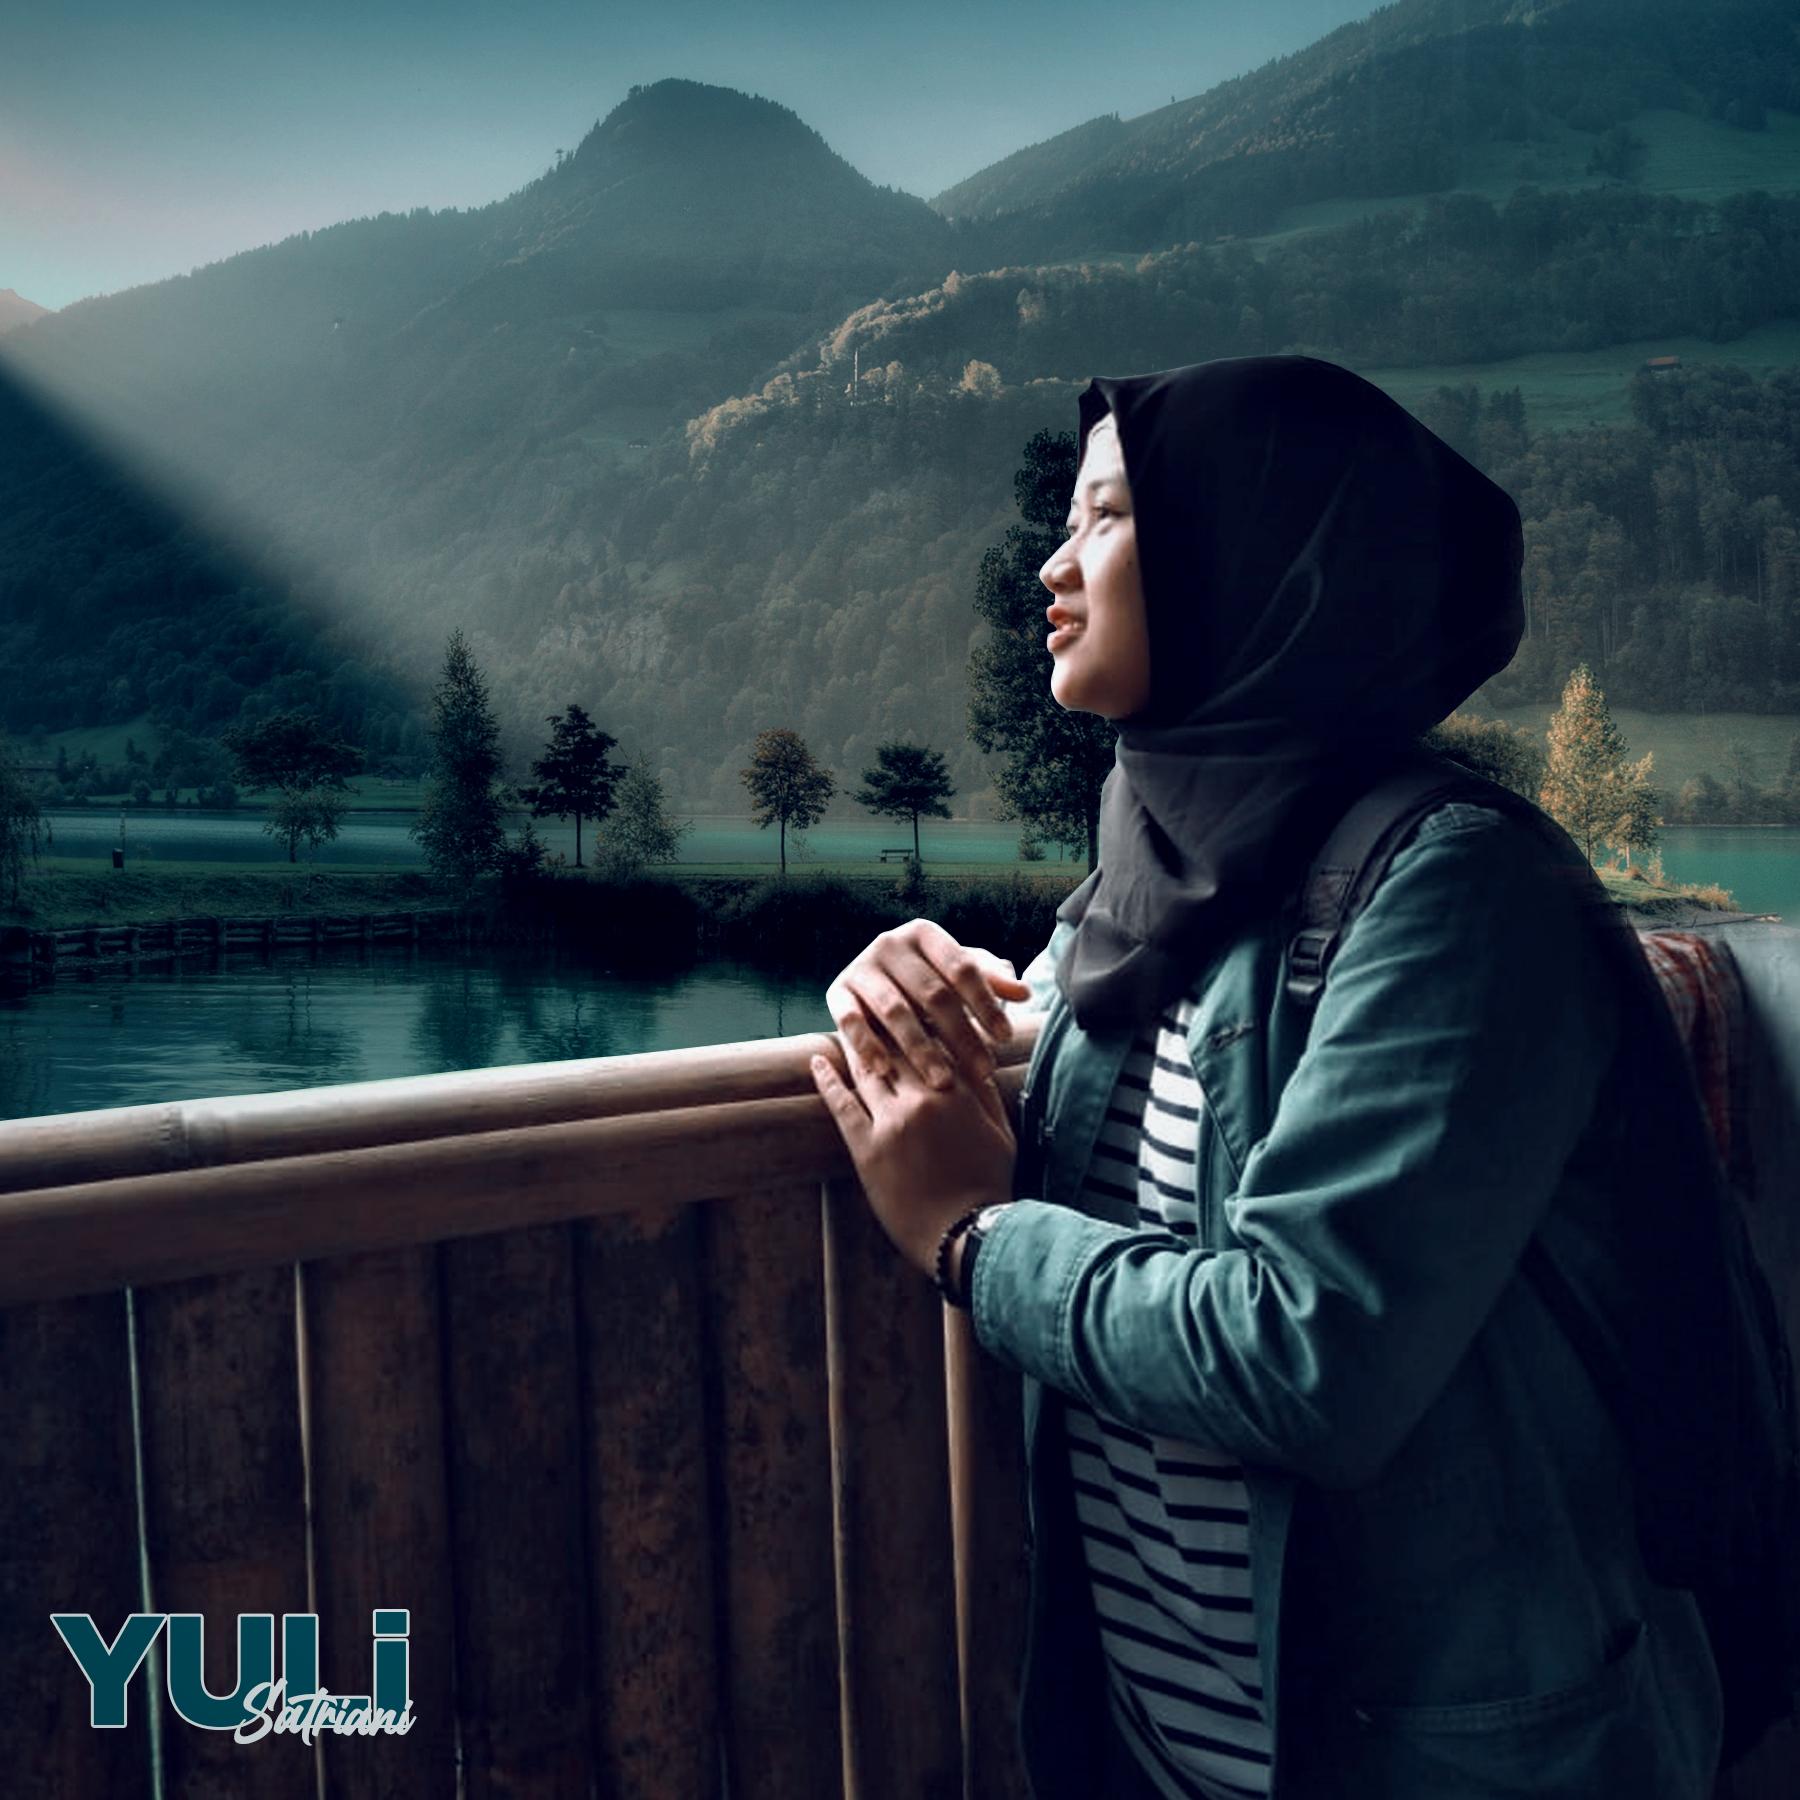 Yuli Satriani Wallpaper Gambar Gunung Galunggung Tasikmalaya Keren HD